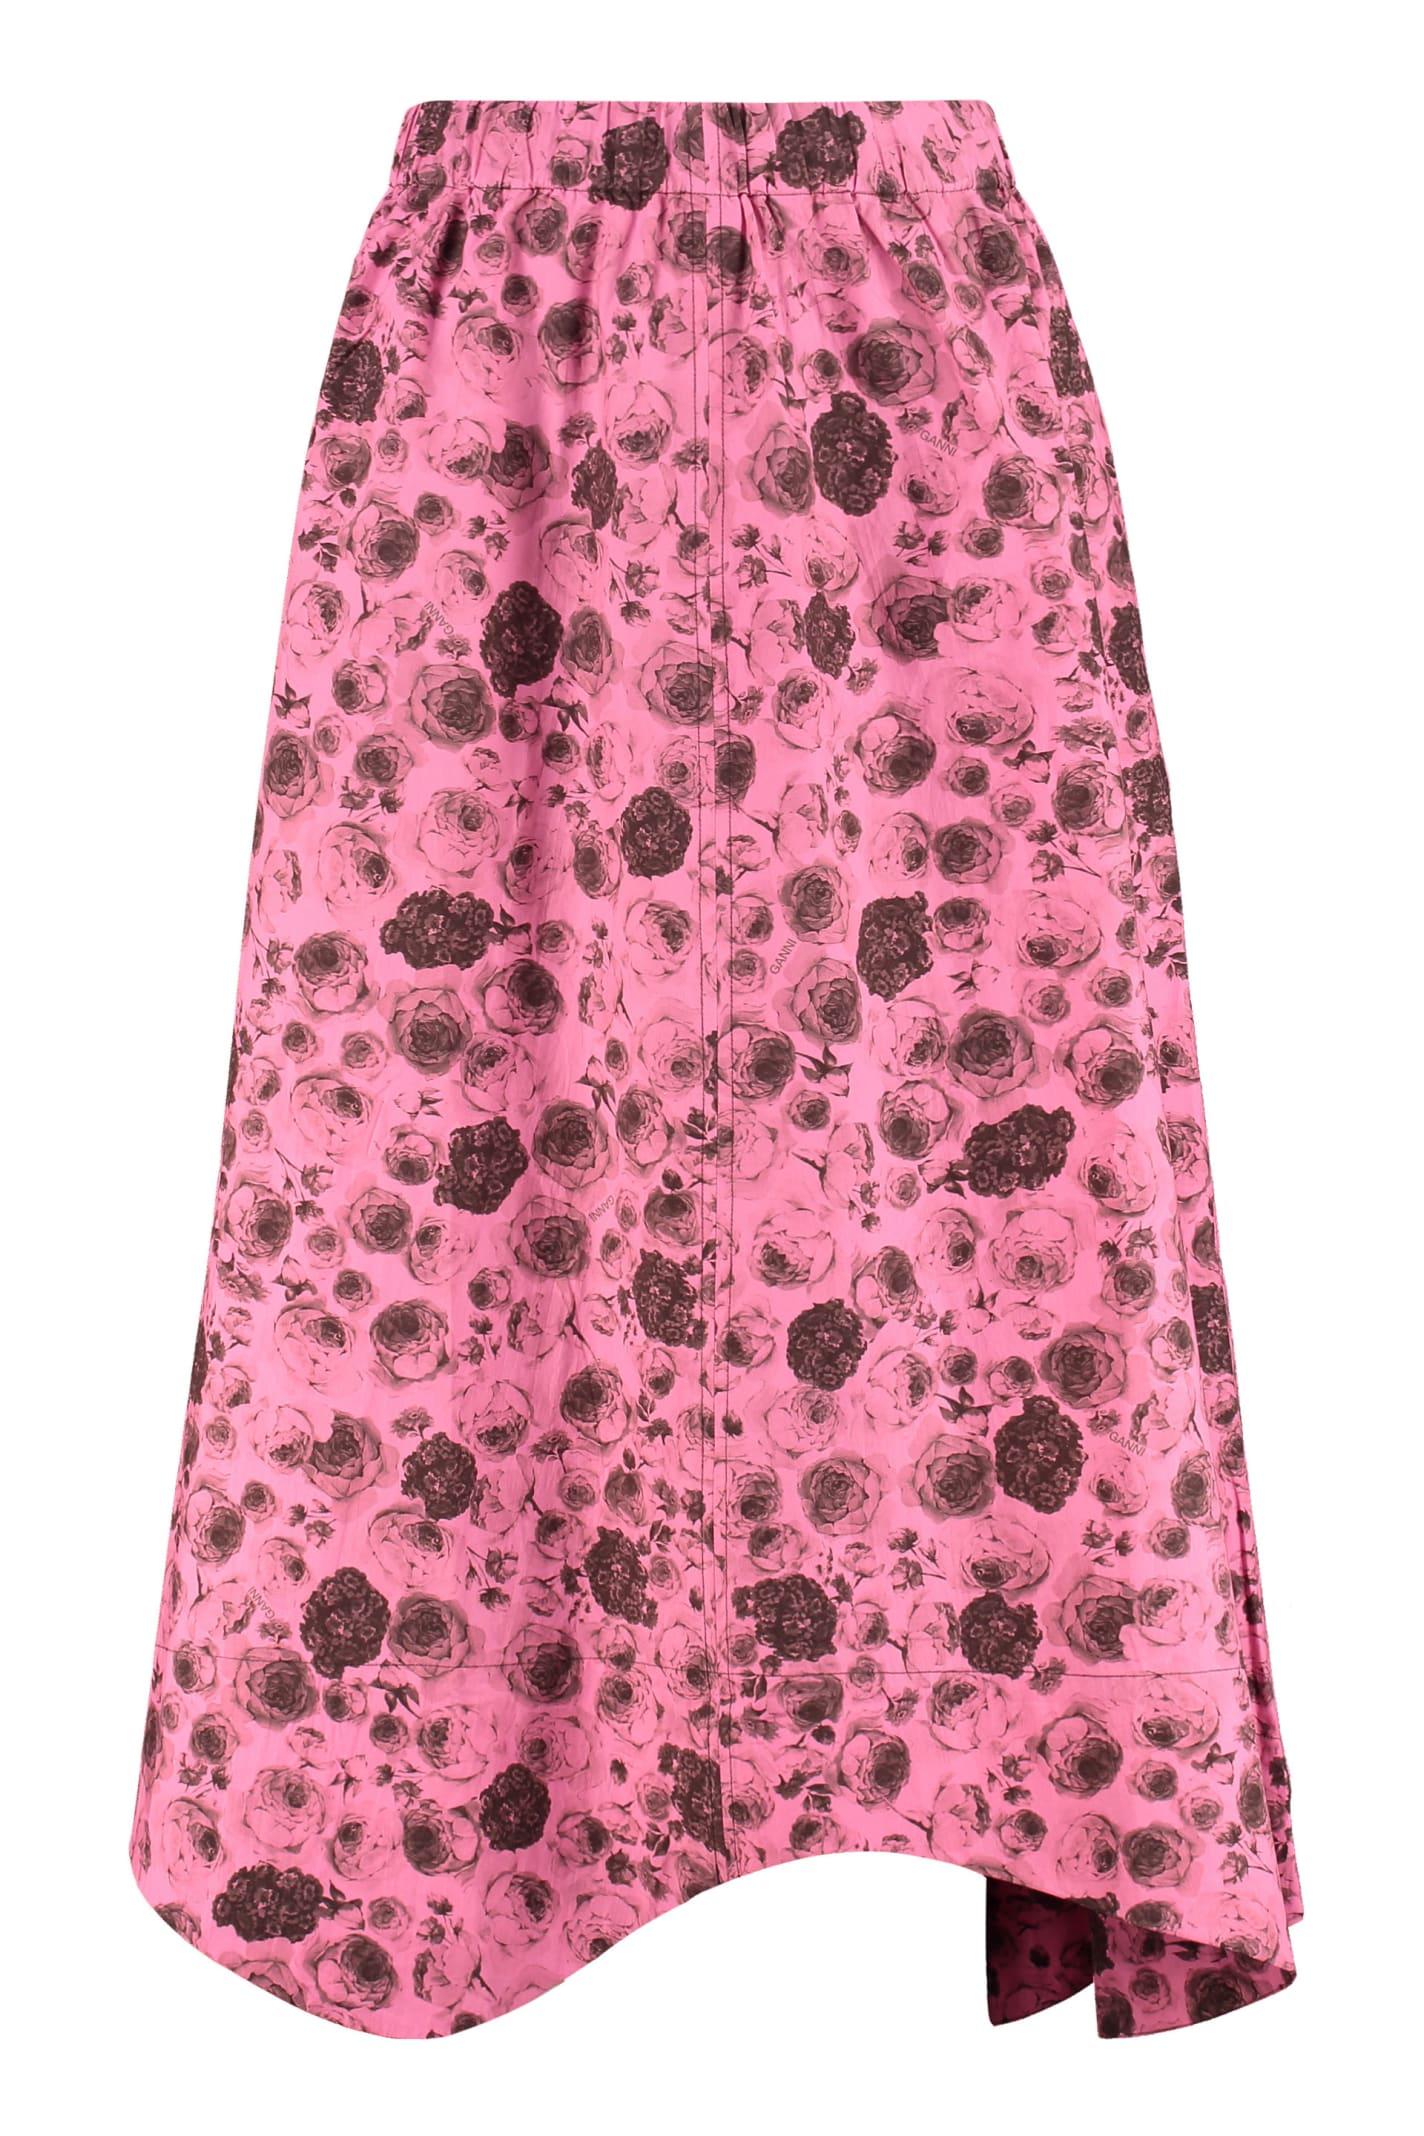 Ganni Printed Cotton Skirt